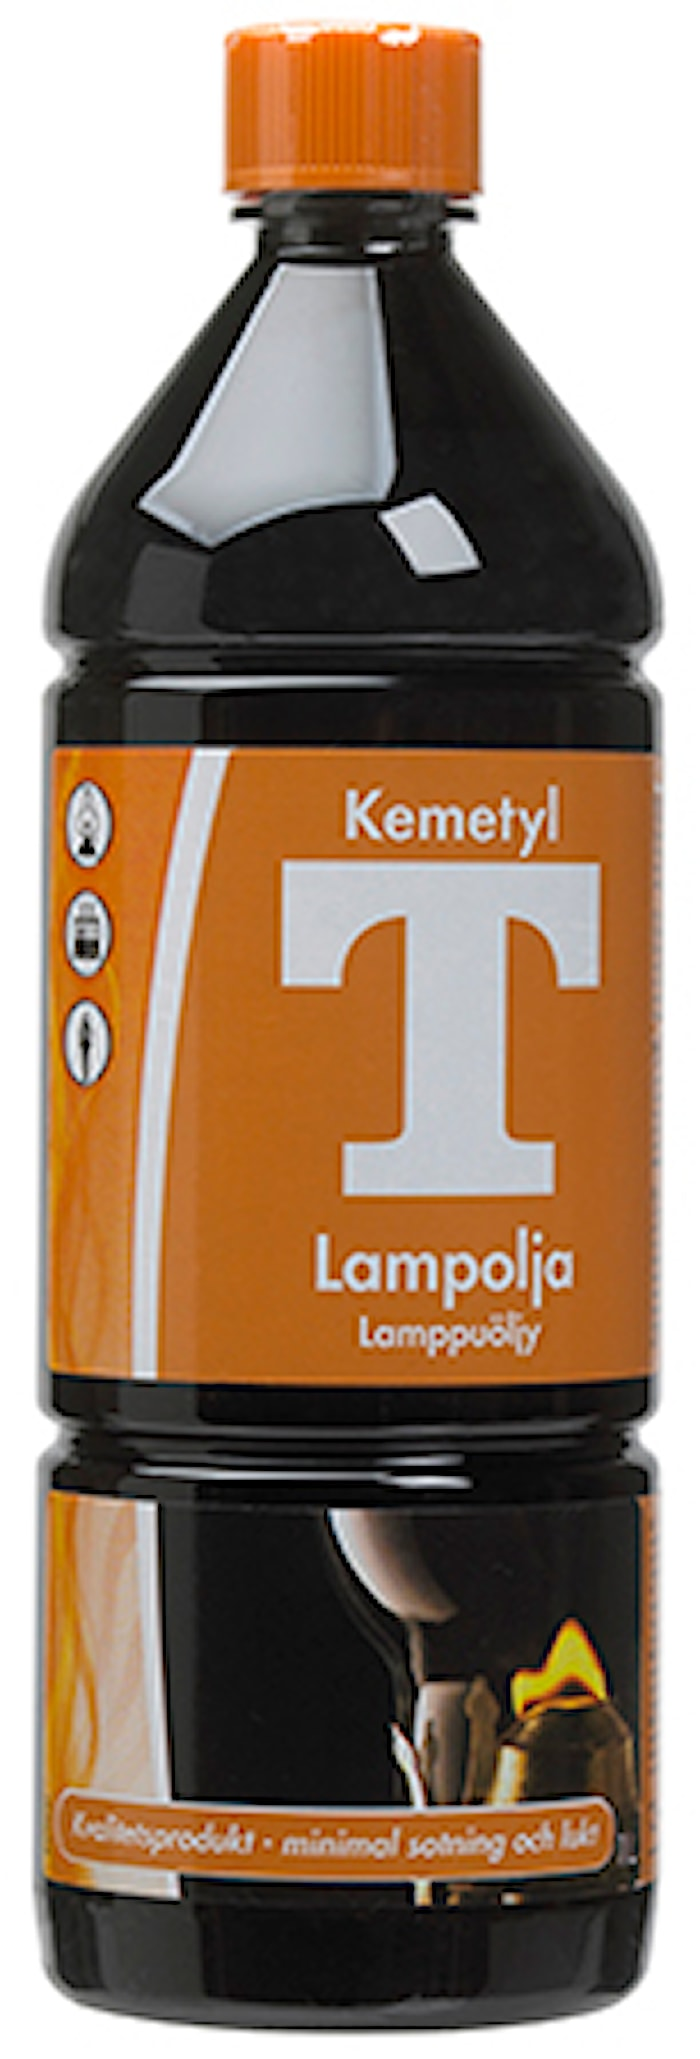 Kemetyl T-Lampolja